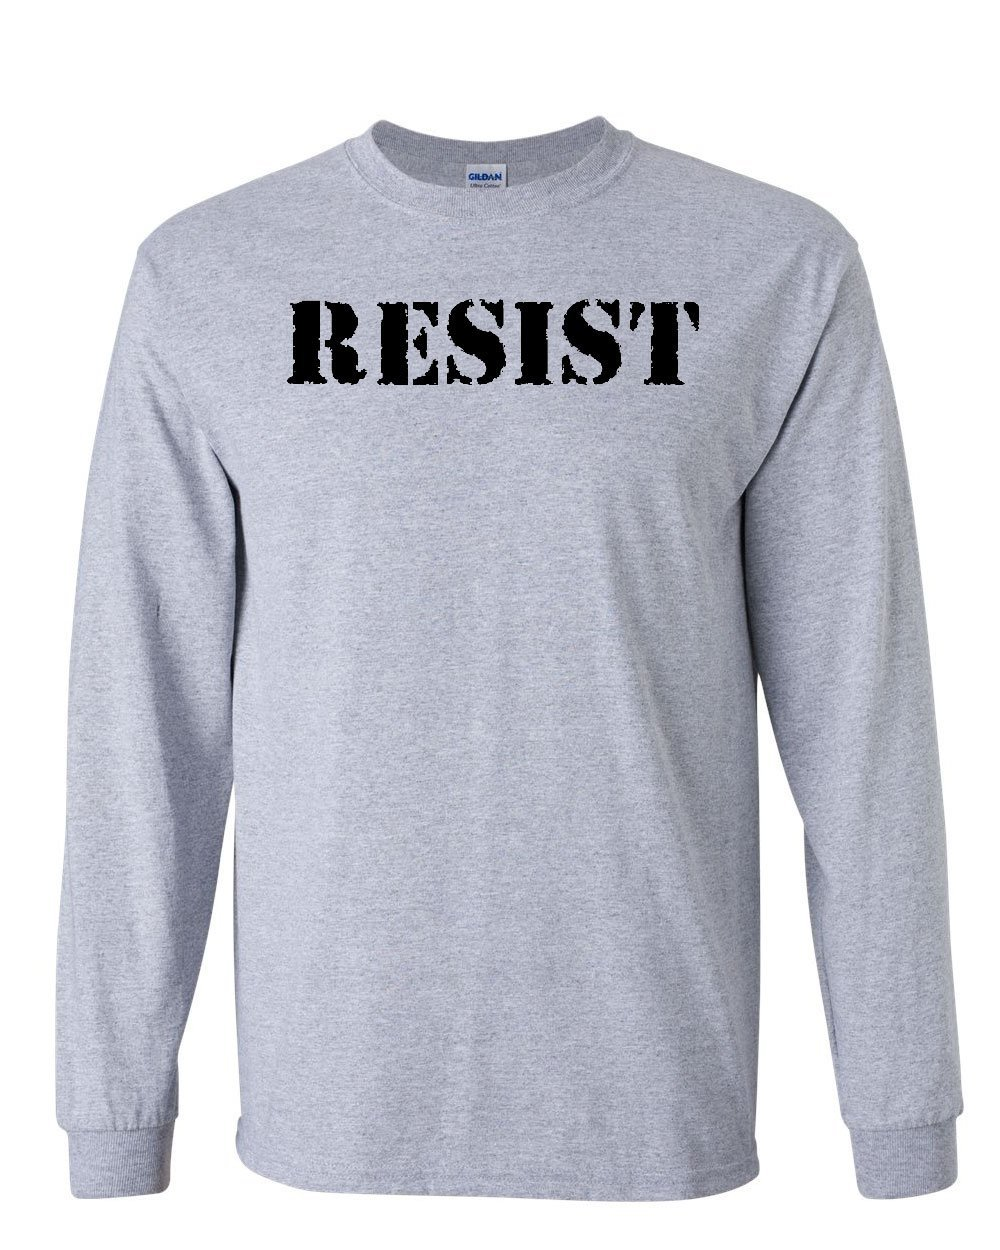 Resist T Shirt Political Anti Trump Protest Rebel Impeach Fight Tee